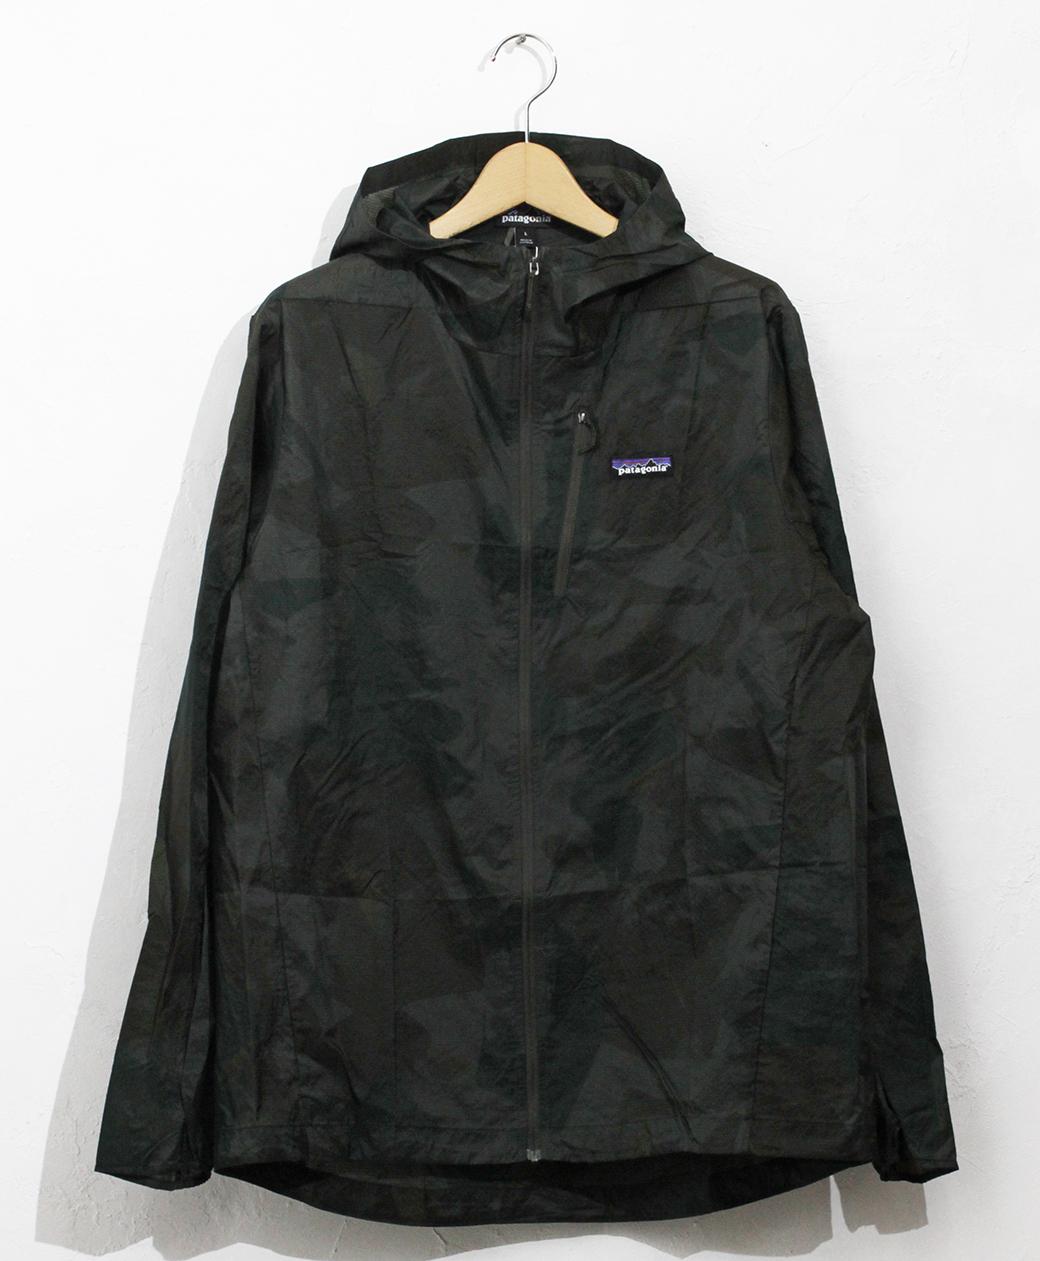 patagonia M's Houdini Jacket(PFBG)